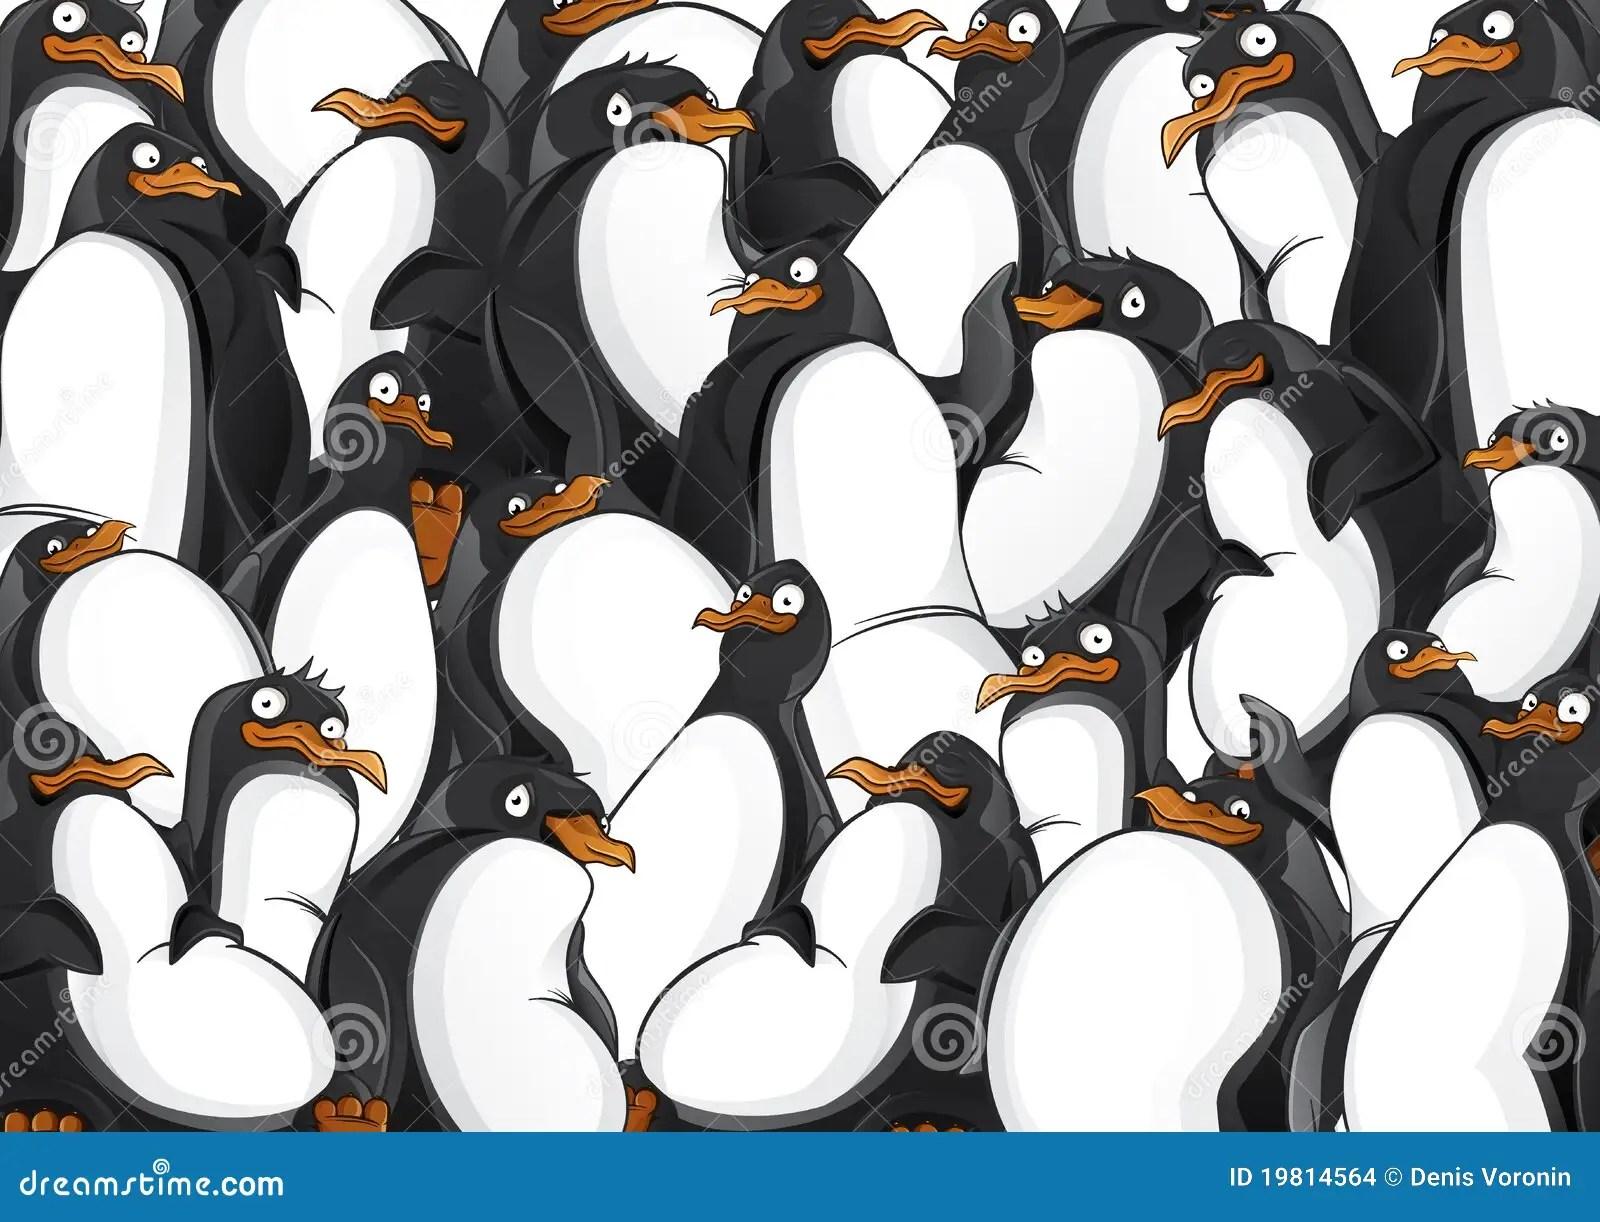 Penguins Pattern Stock Vector Illustration Of Animals